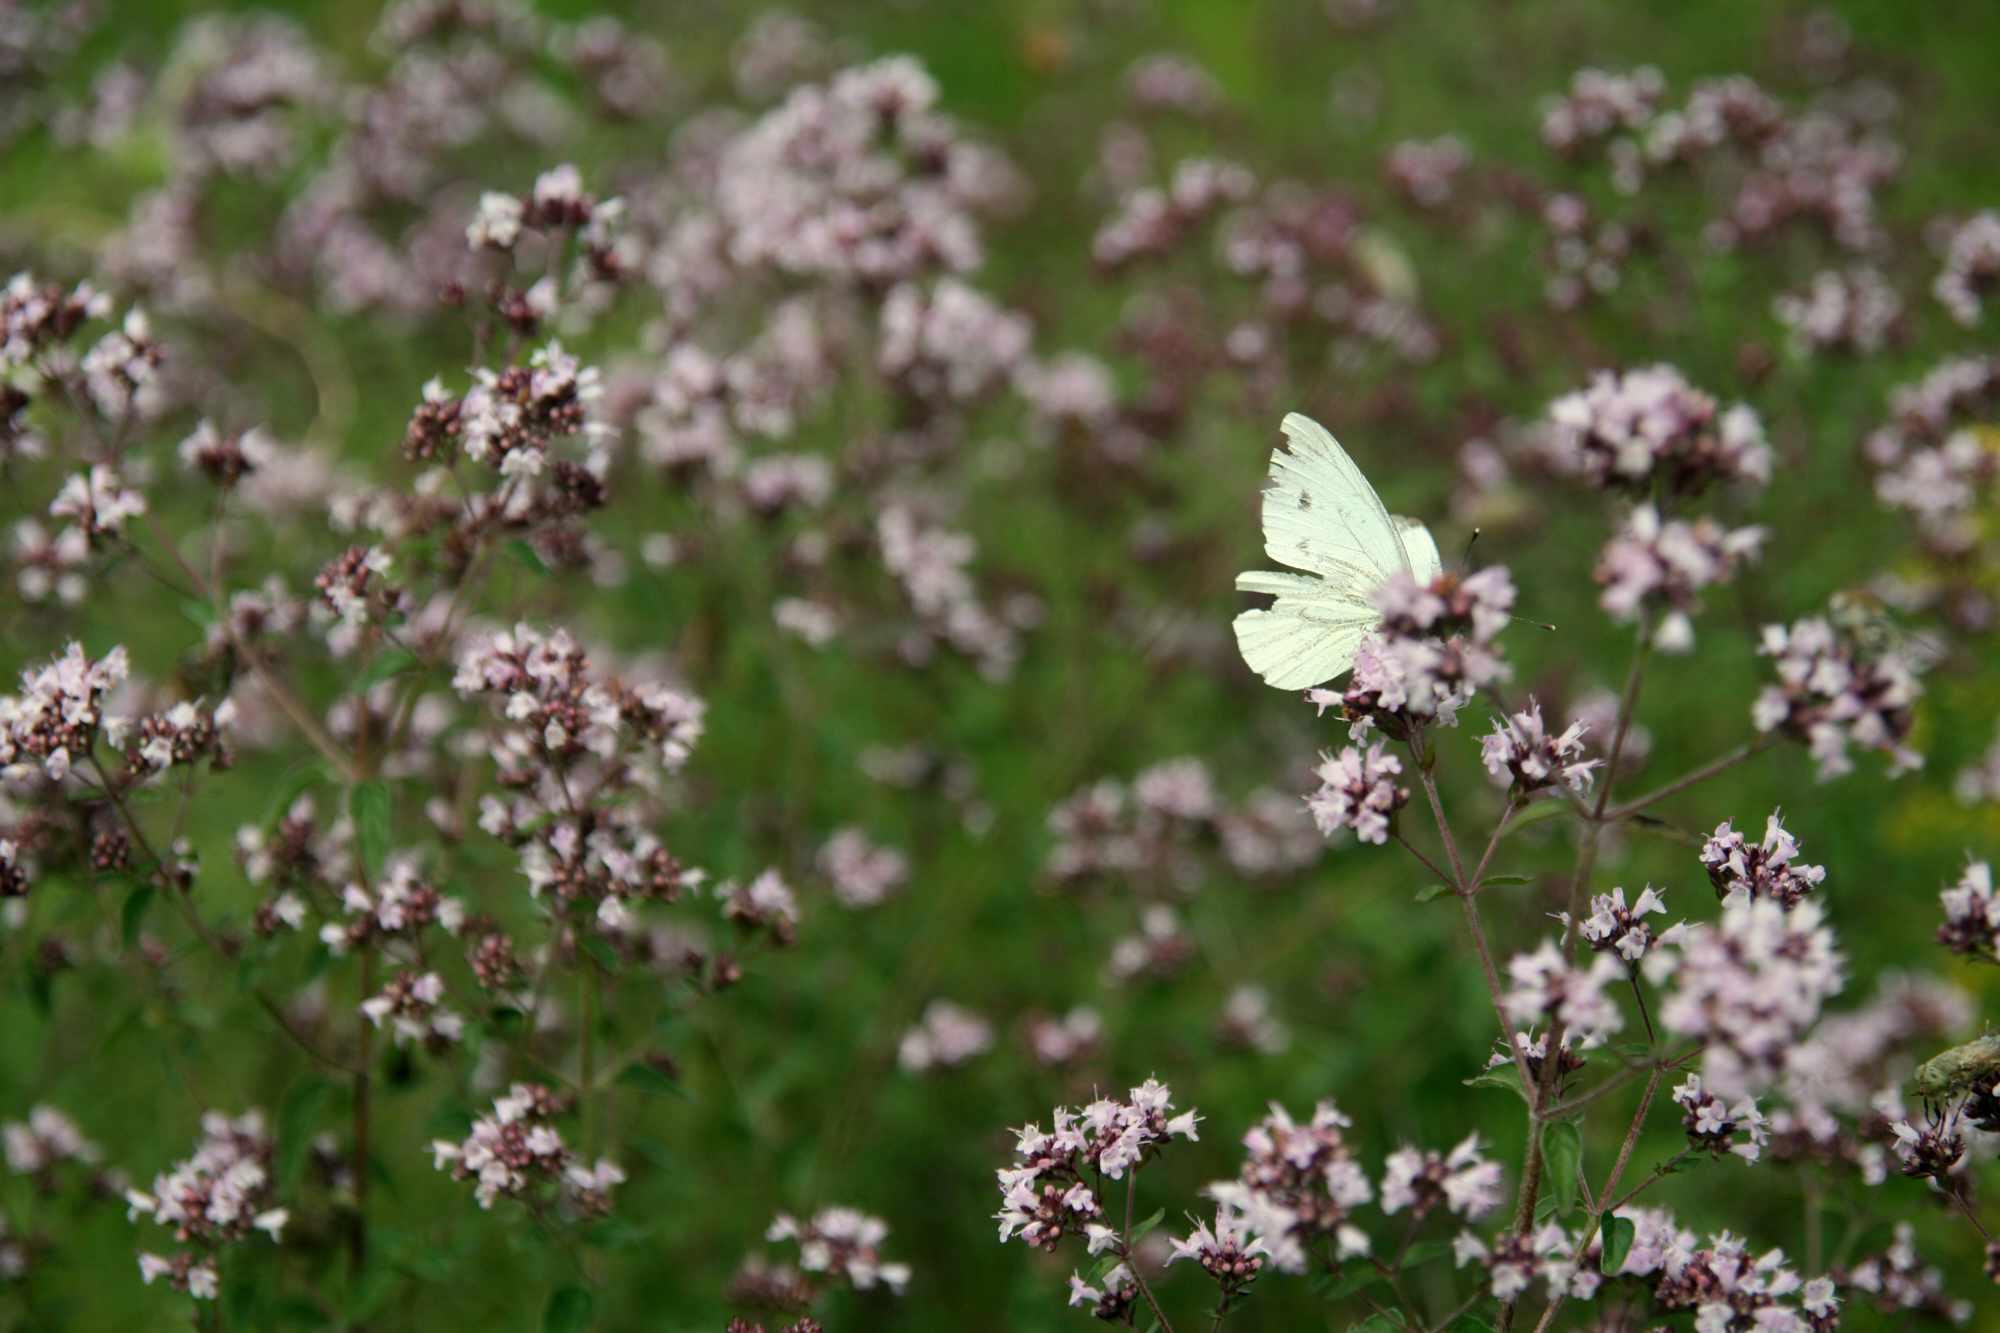 light yellow butterfly rests in field of pale pink-purple flowers